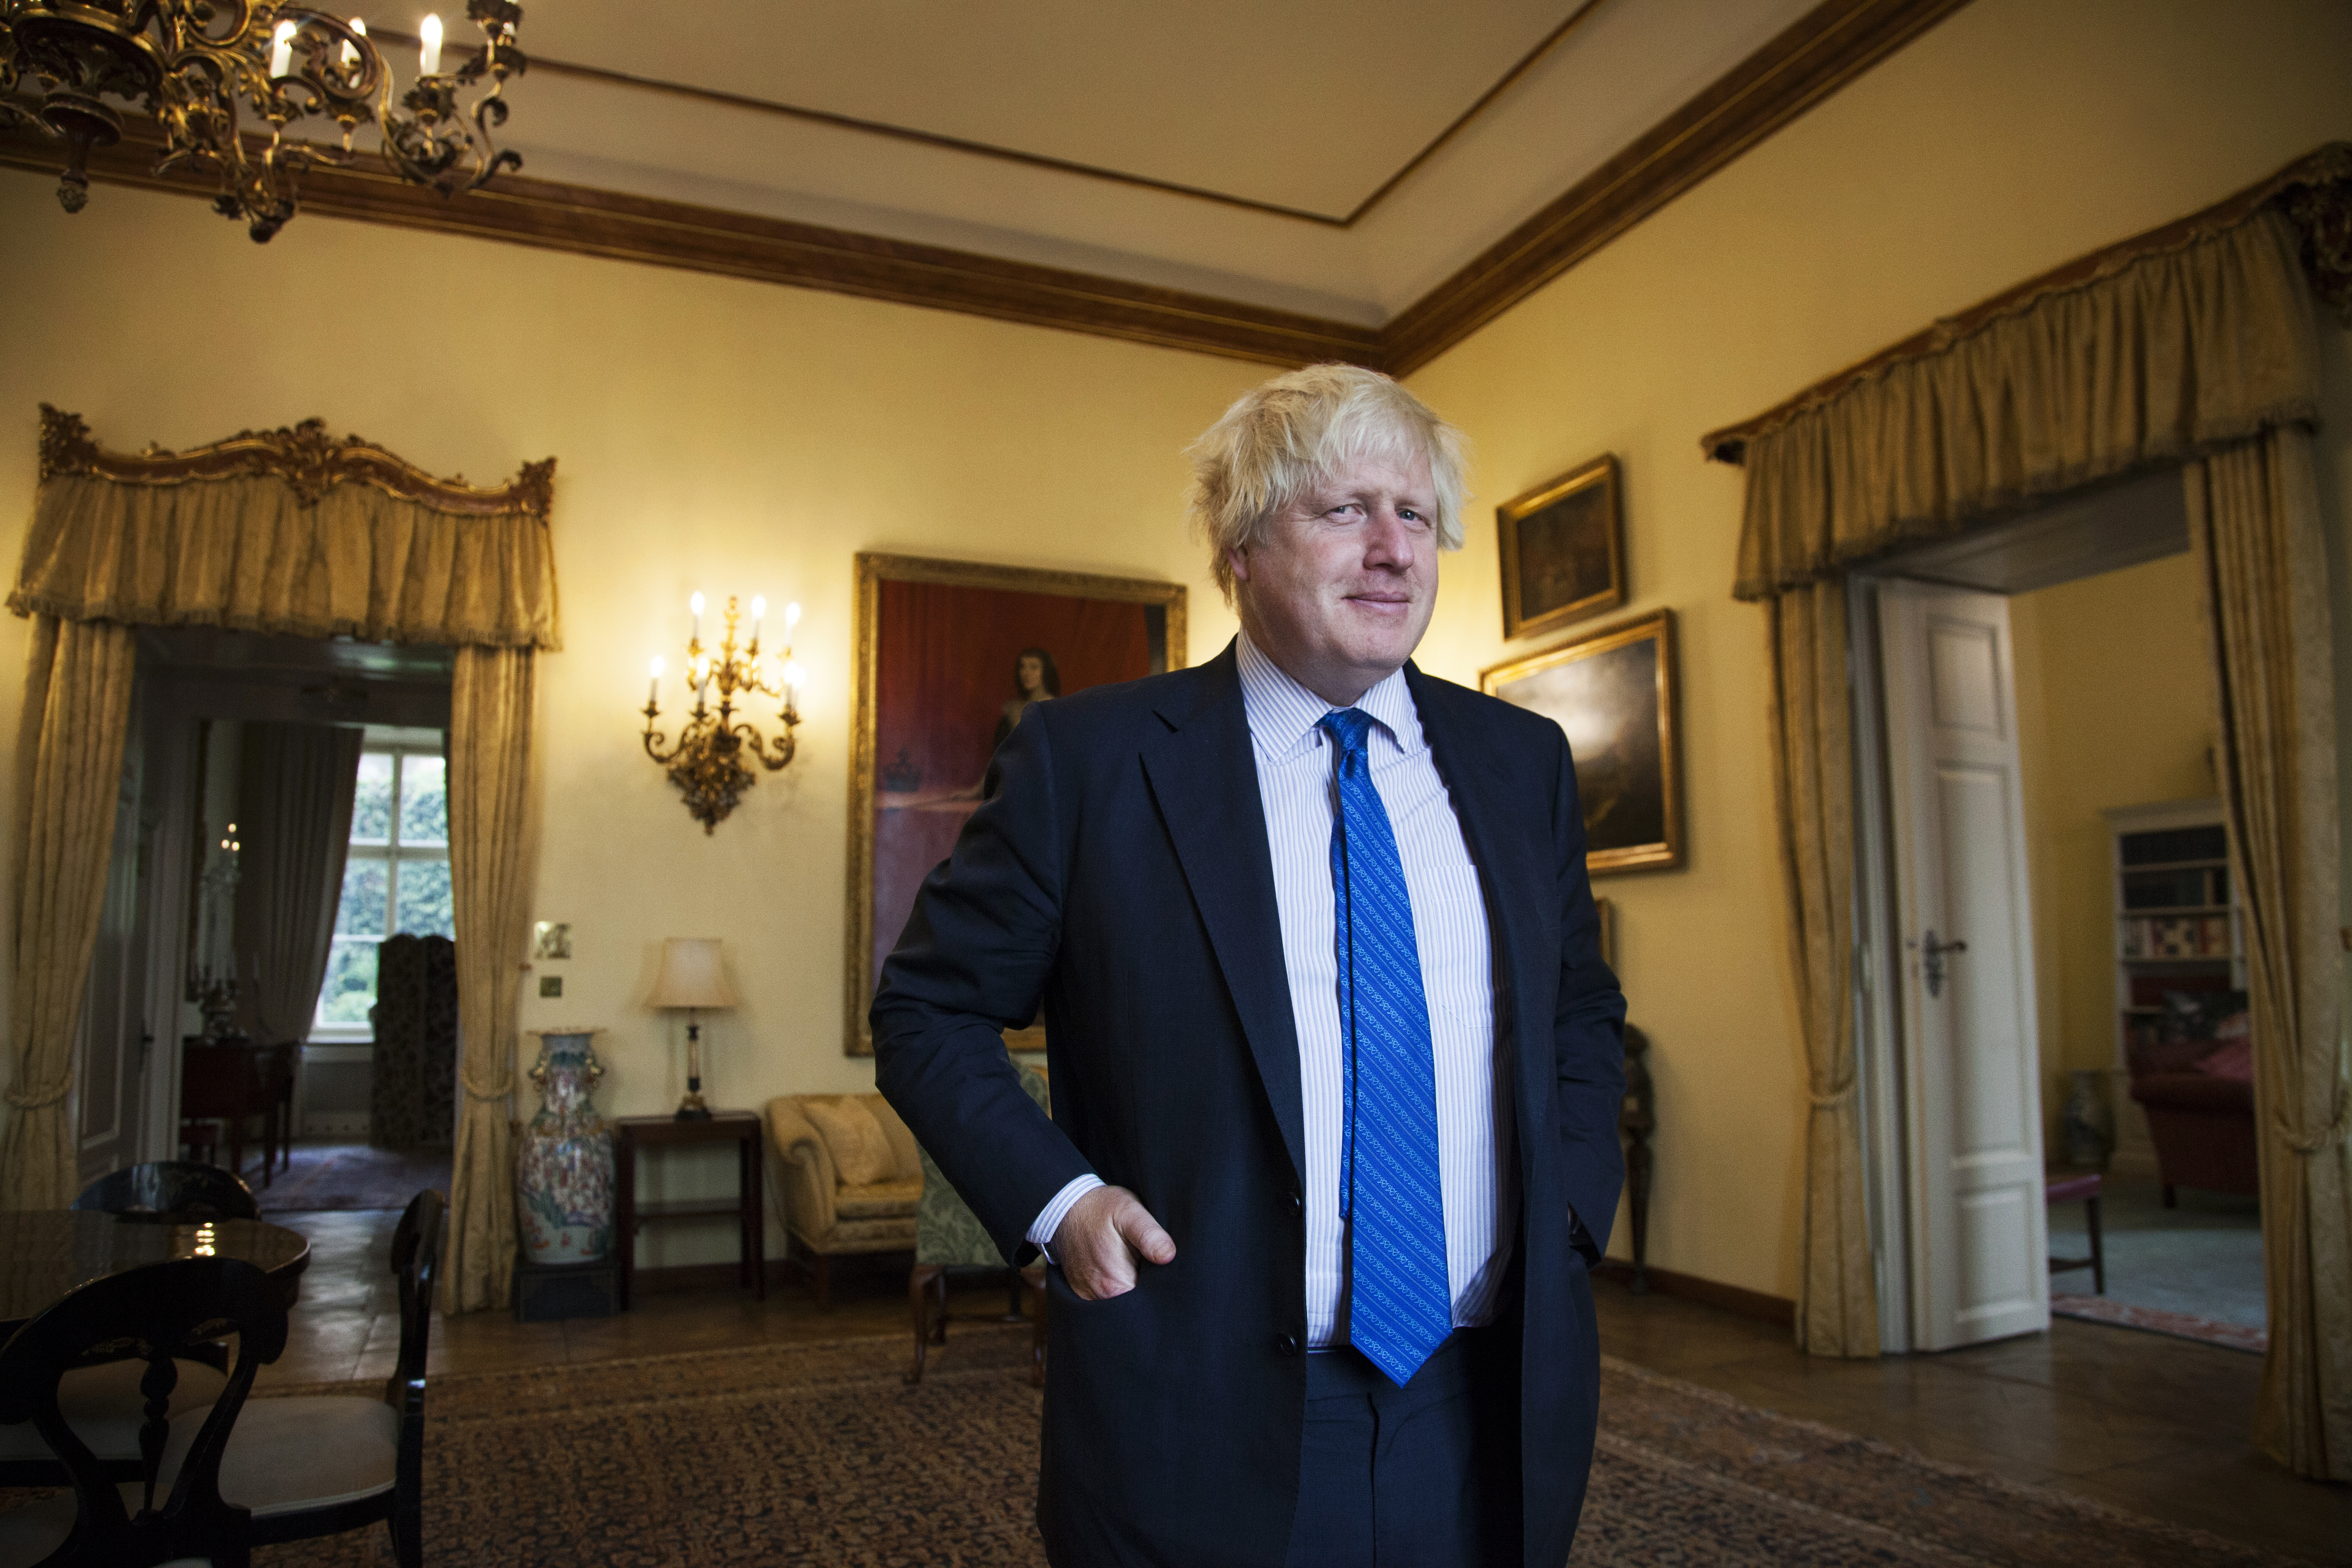 Bývalý britský ministr zahraničí Boris Johnson